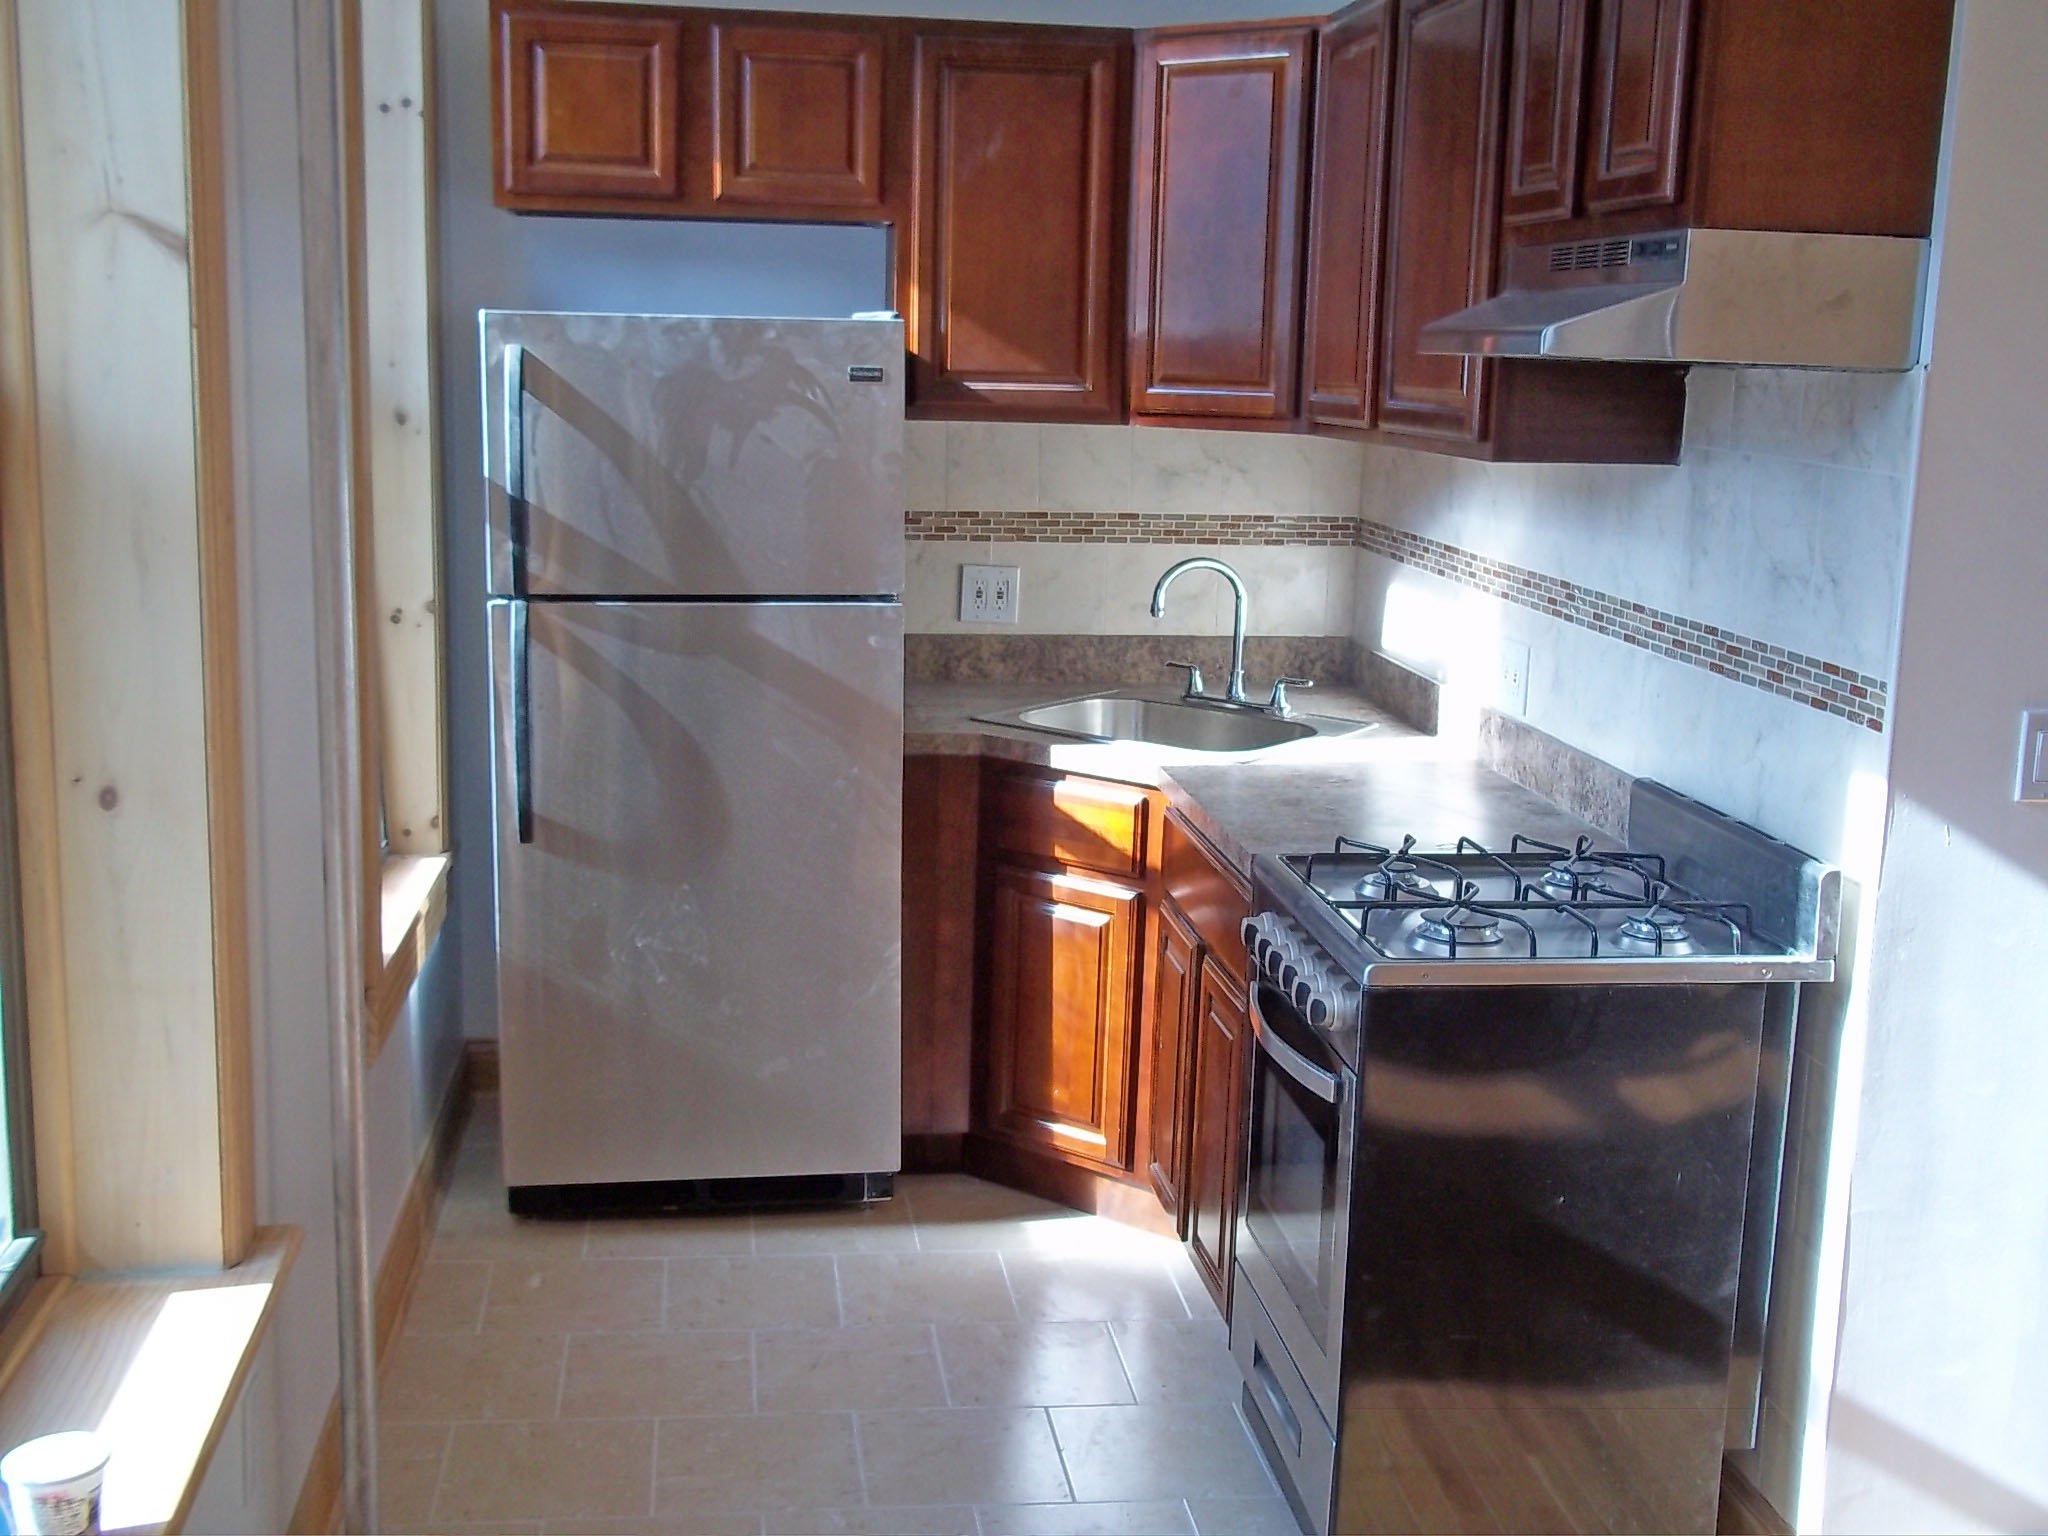 Bedford Stuyvesant 1 Bedroom Apartment for Rent Brooklyn ...